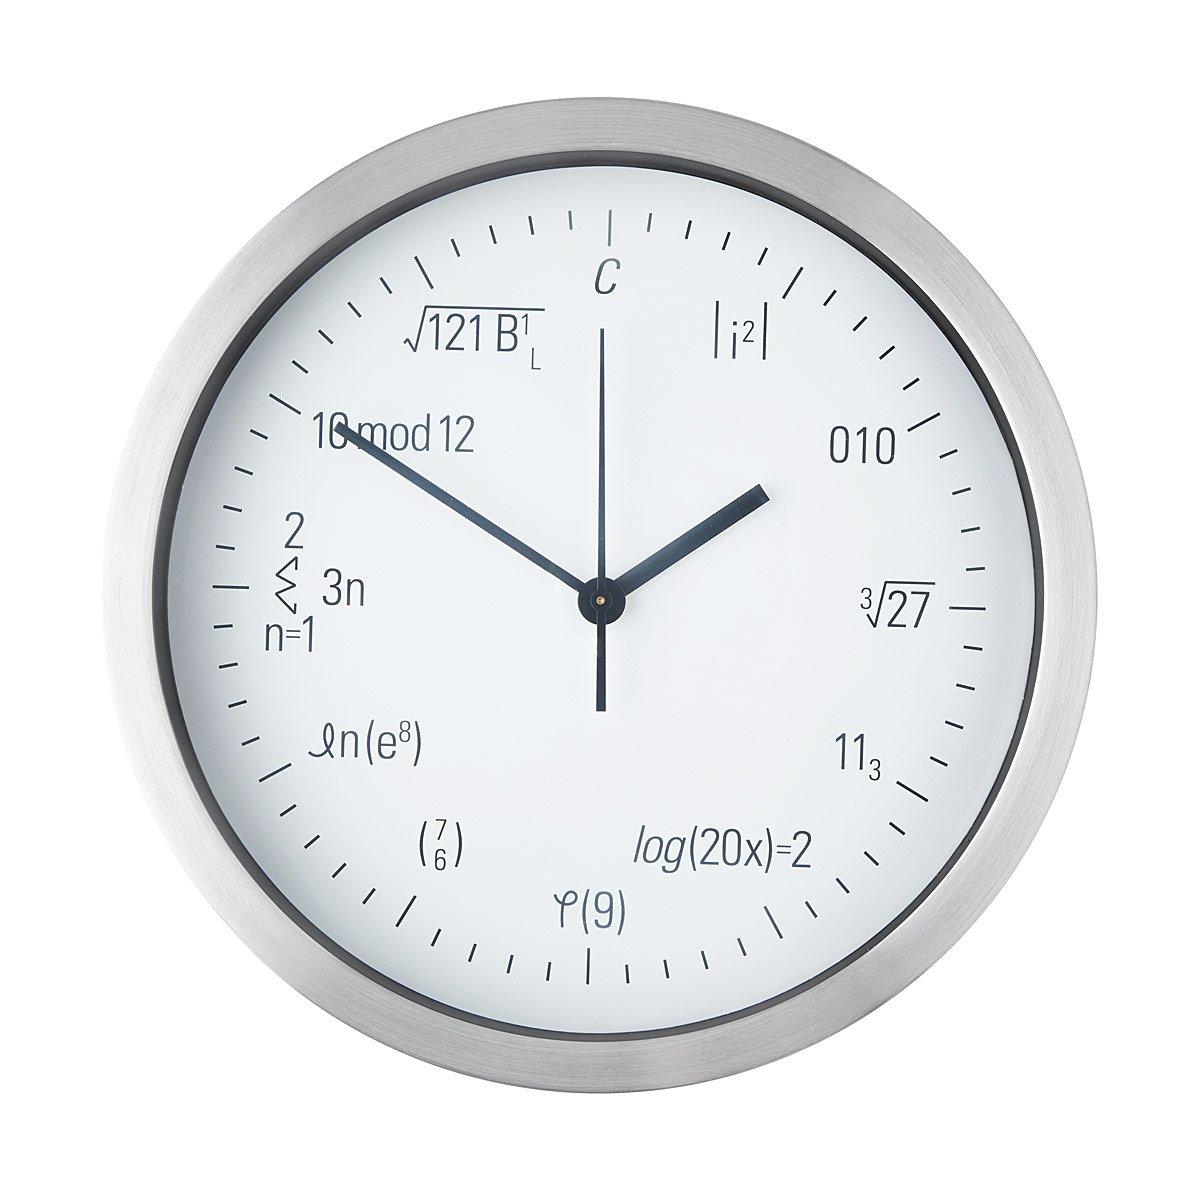 worksheet Clock Math equation geek clock math formula for geeks uncommongoods 1 thumbnail